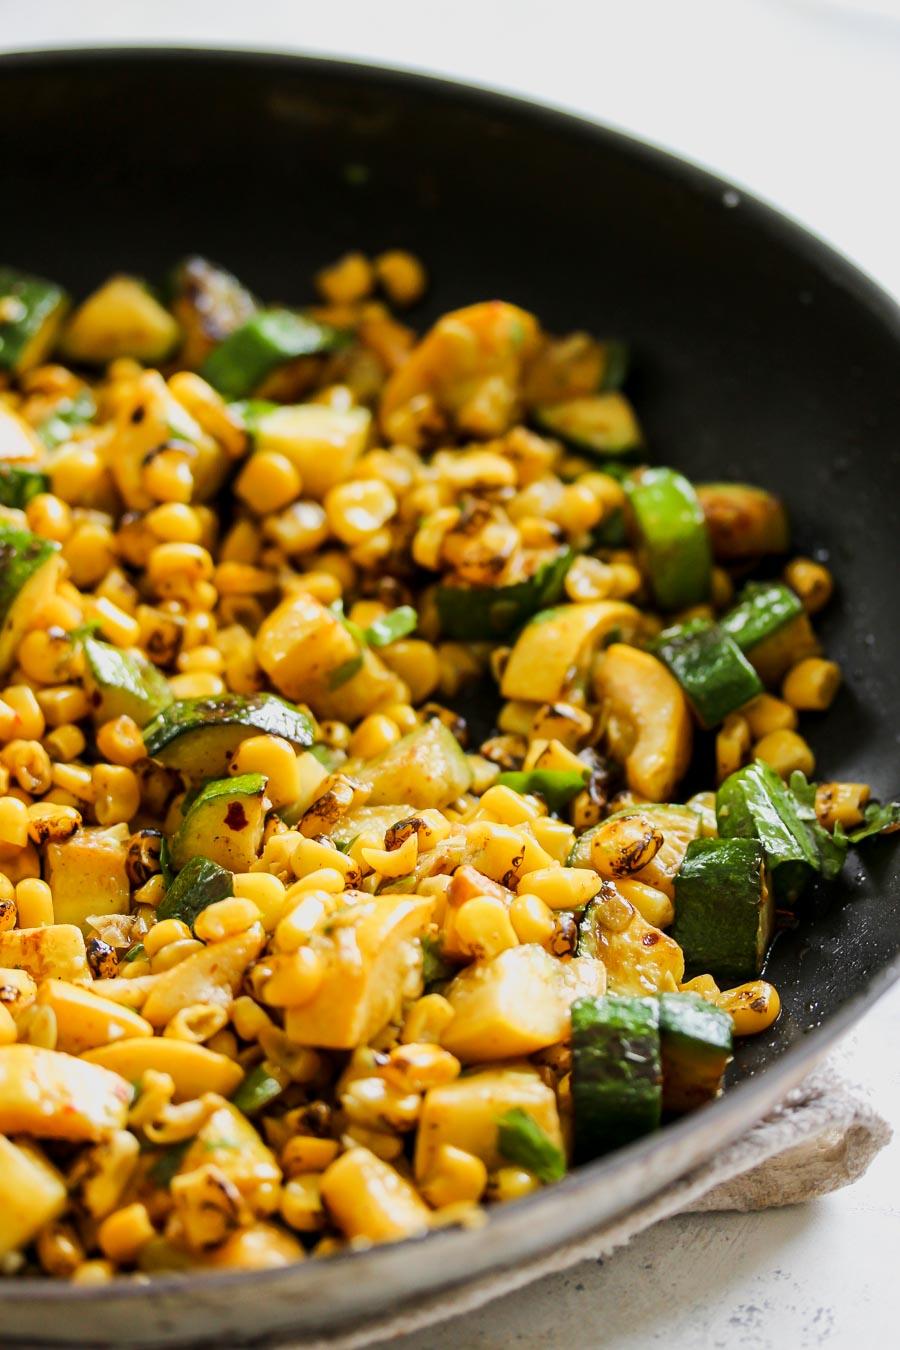 20-Minute Summer Squash and Corn Fiesta Salad